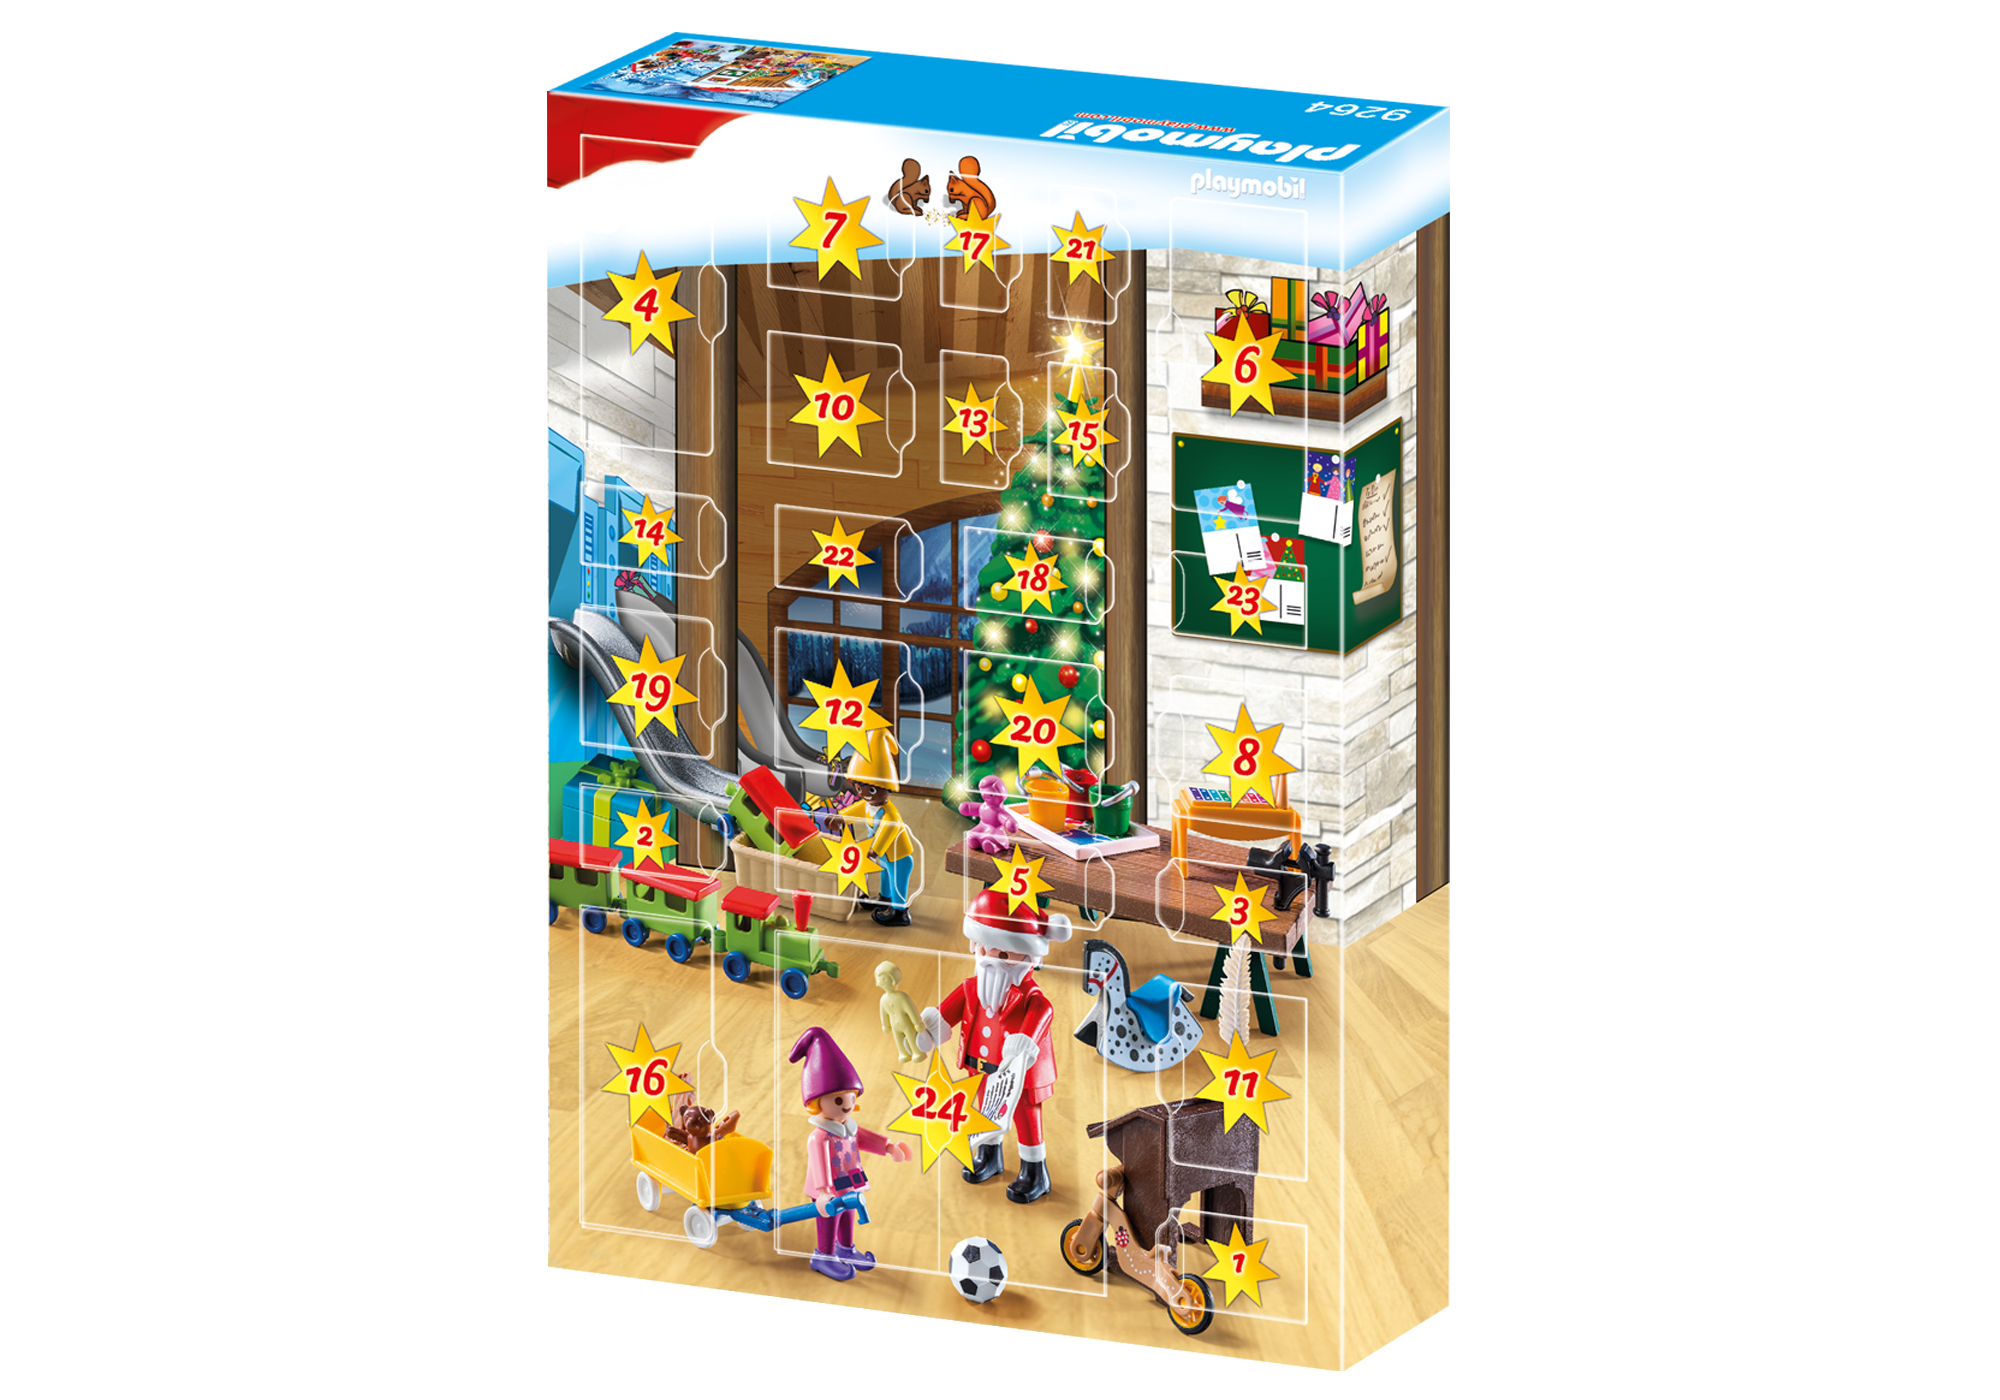 http://media.playmobil.com/i/playmobil/9264_product_extra2/Advent Calendar - Santa's Workshop